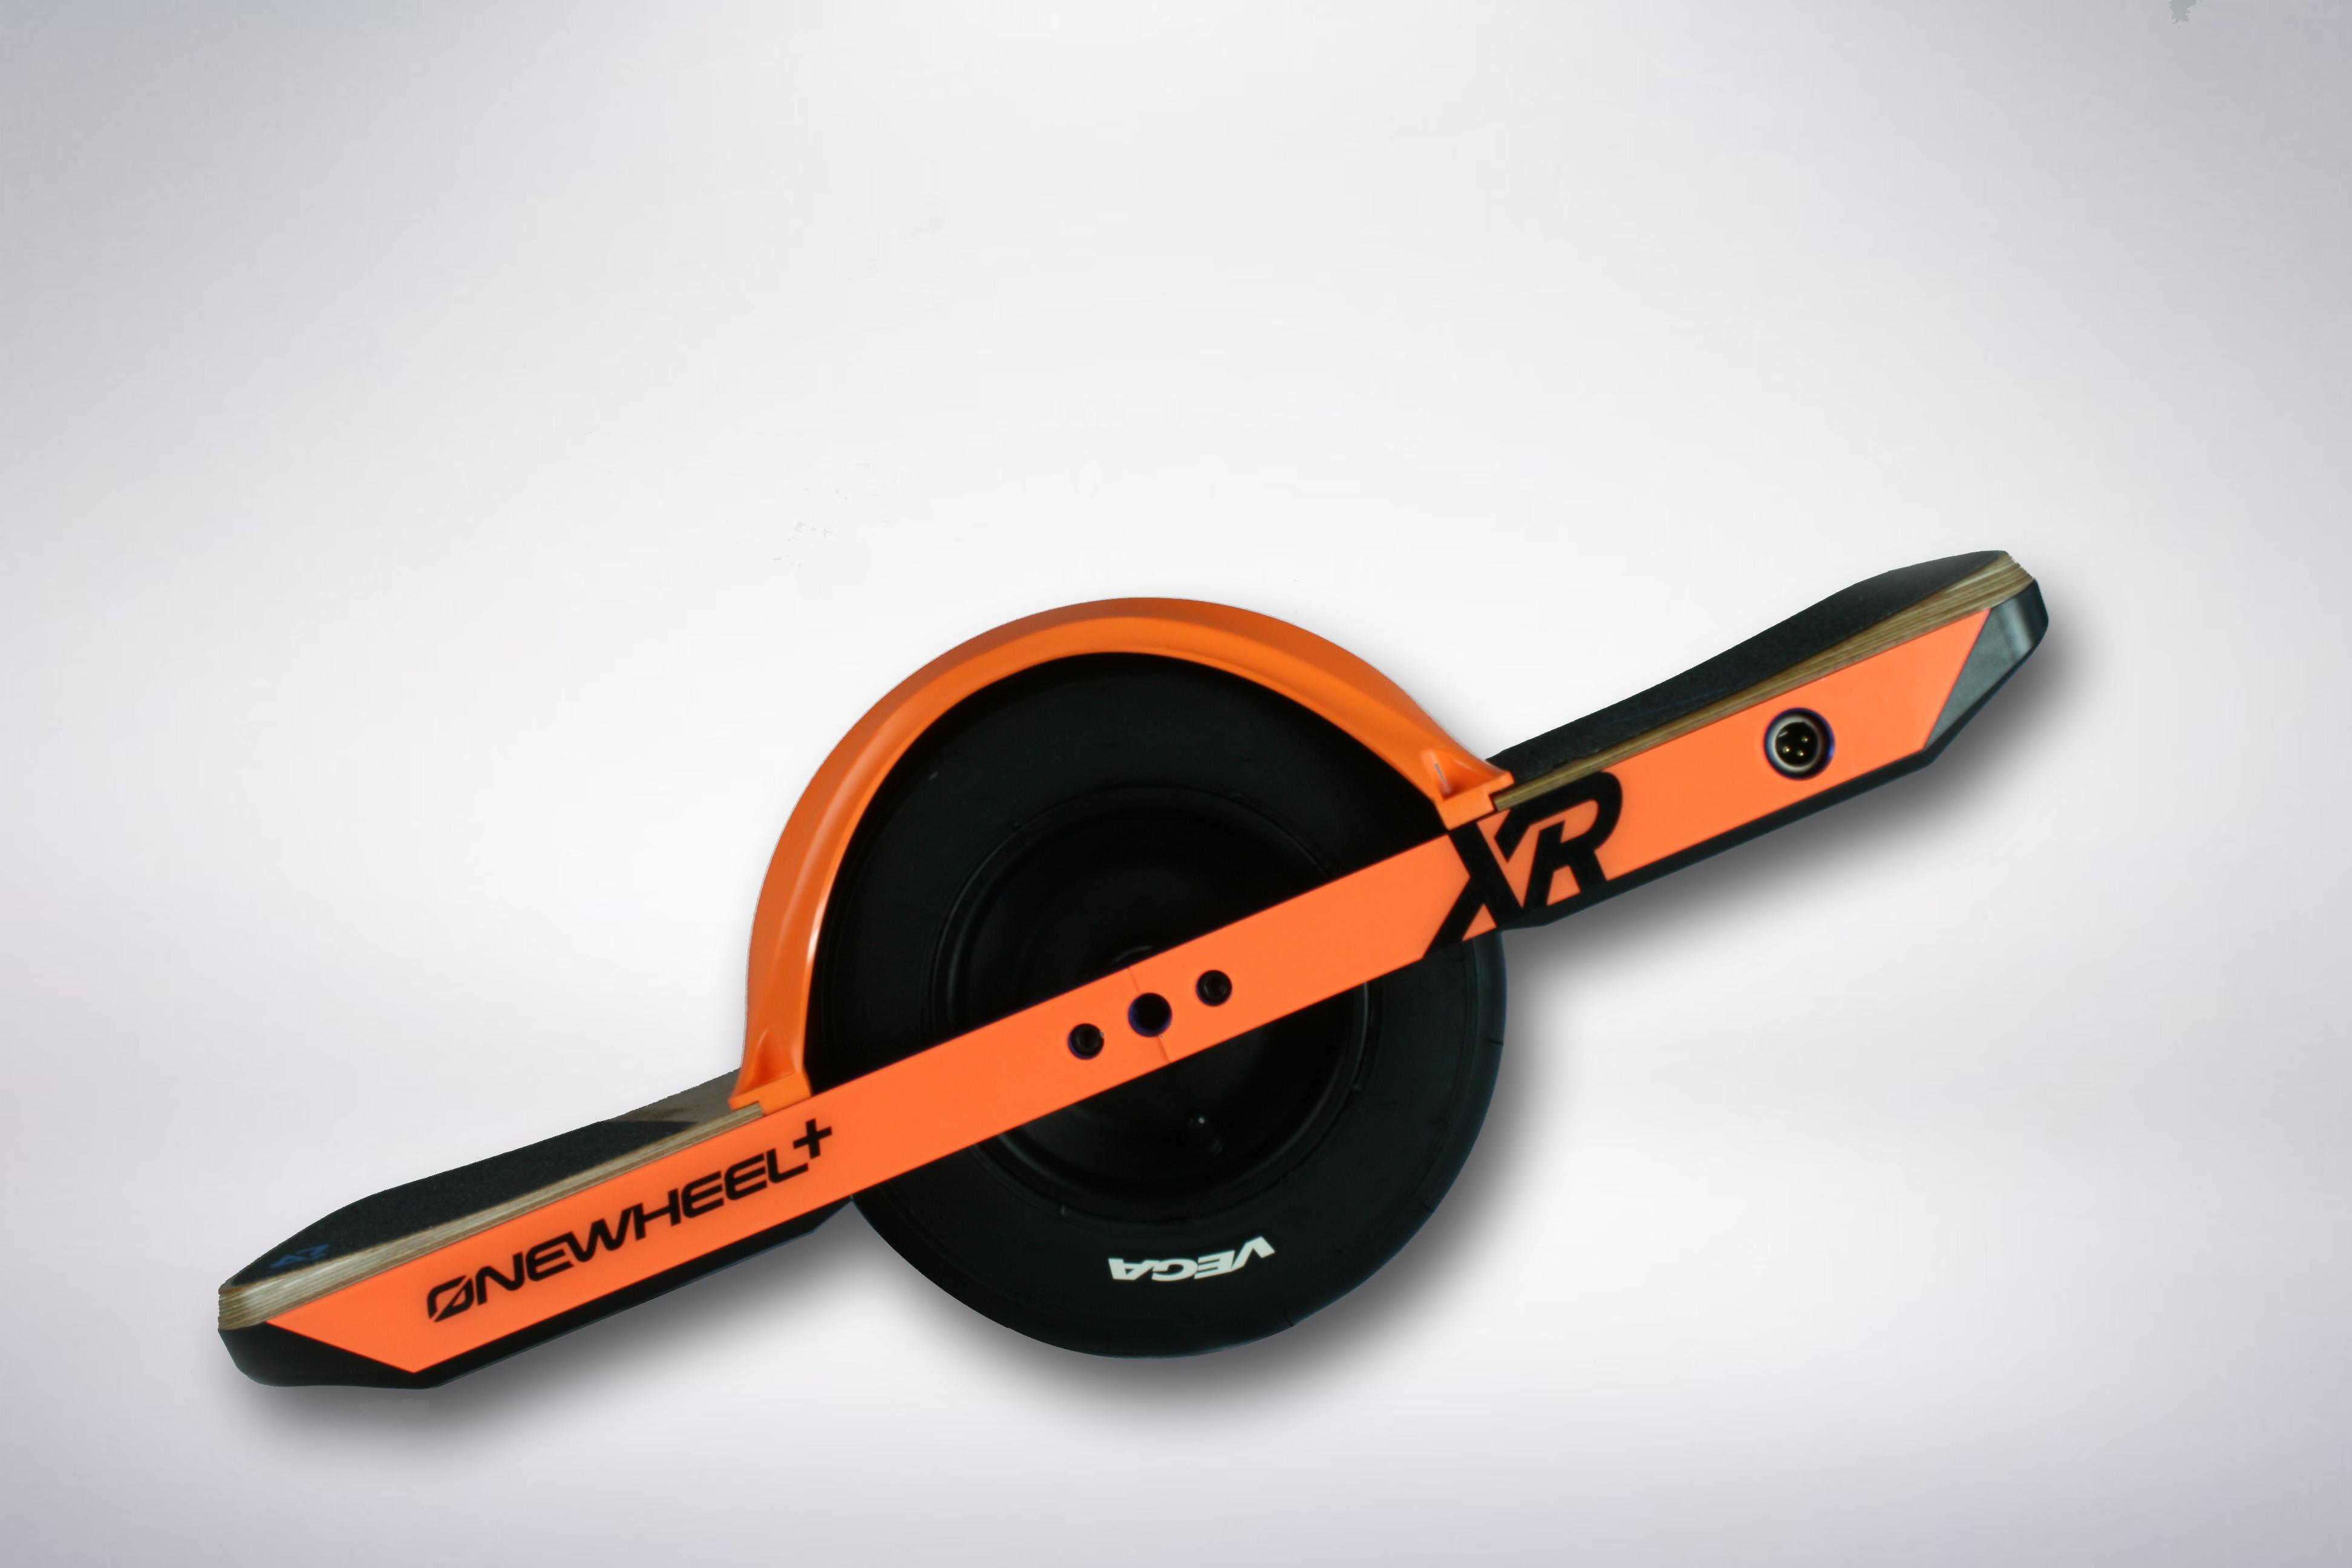 Onewheel XR with orange rail guard and orange fender